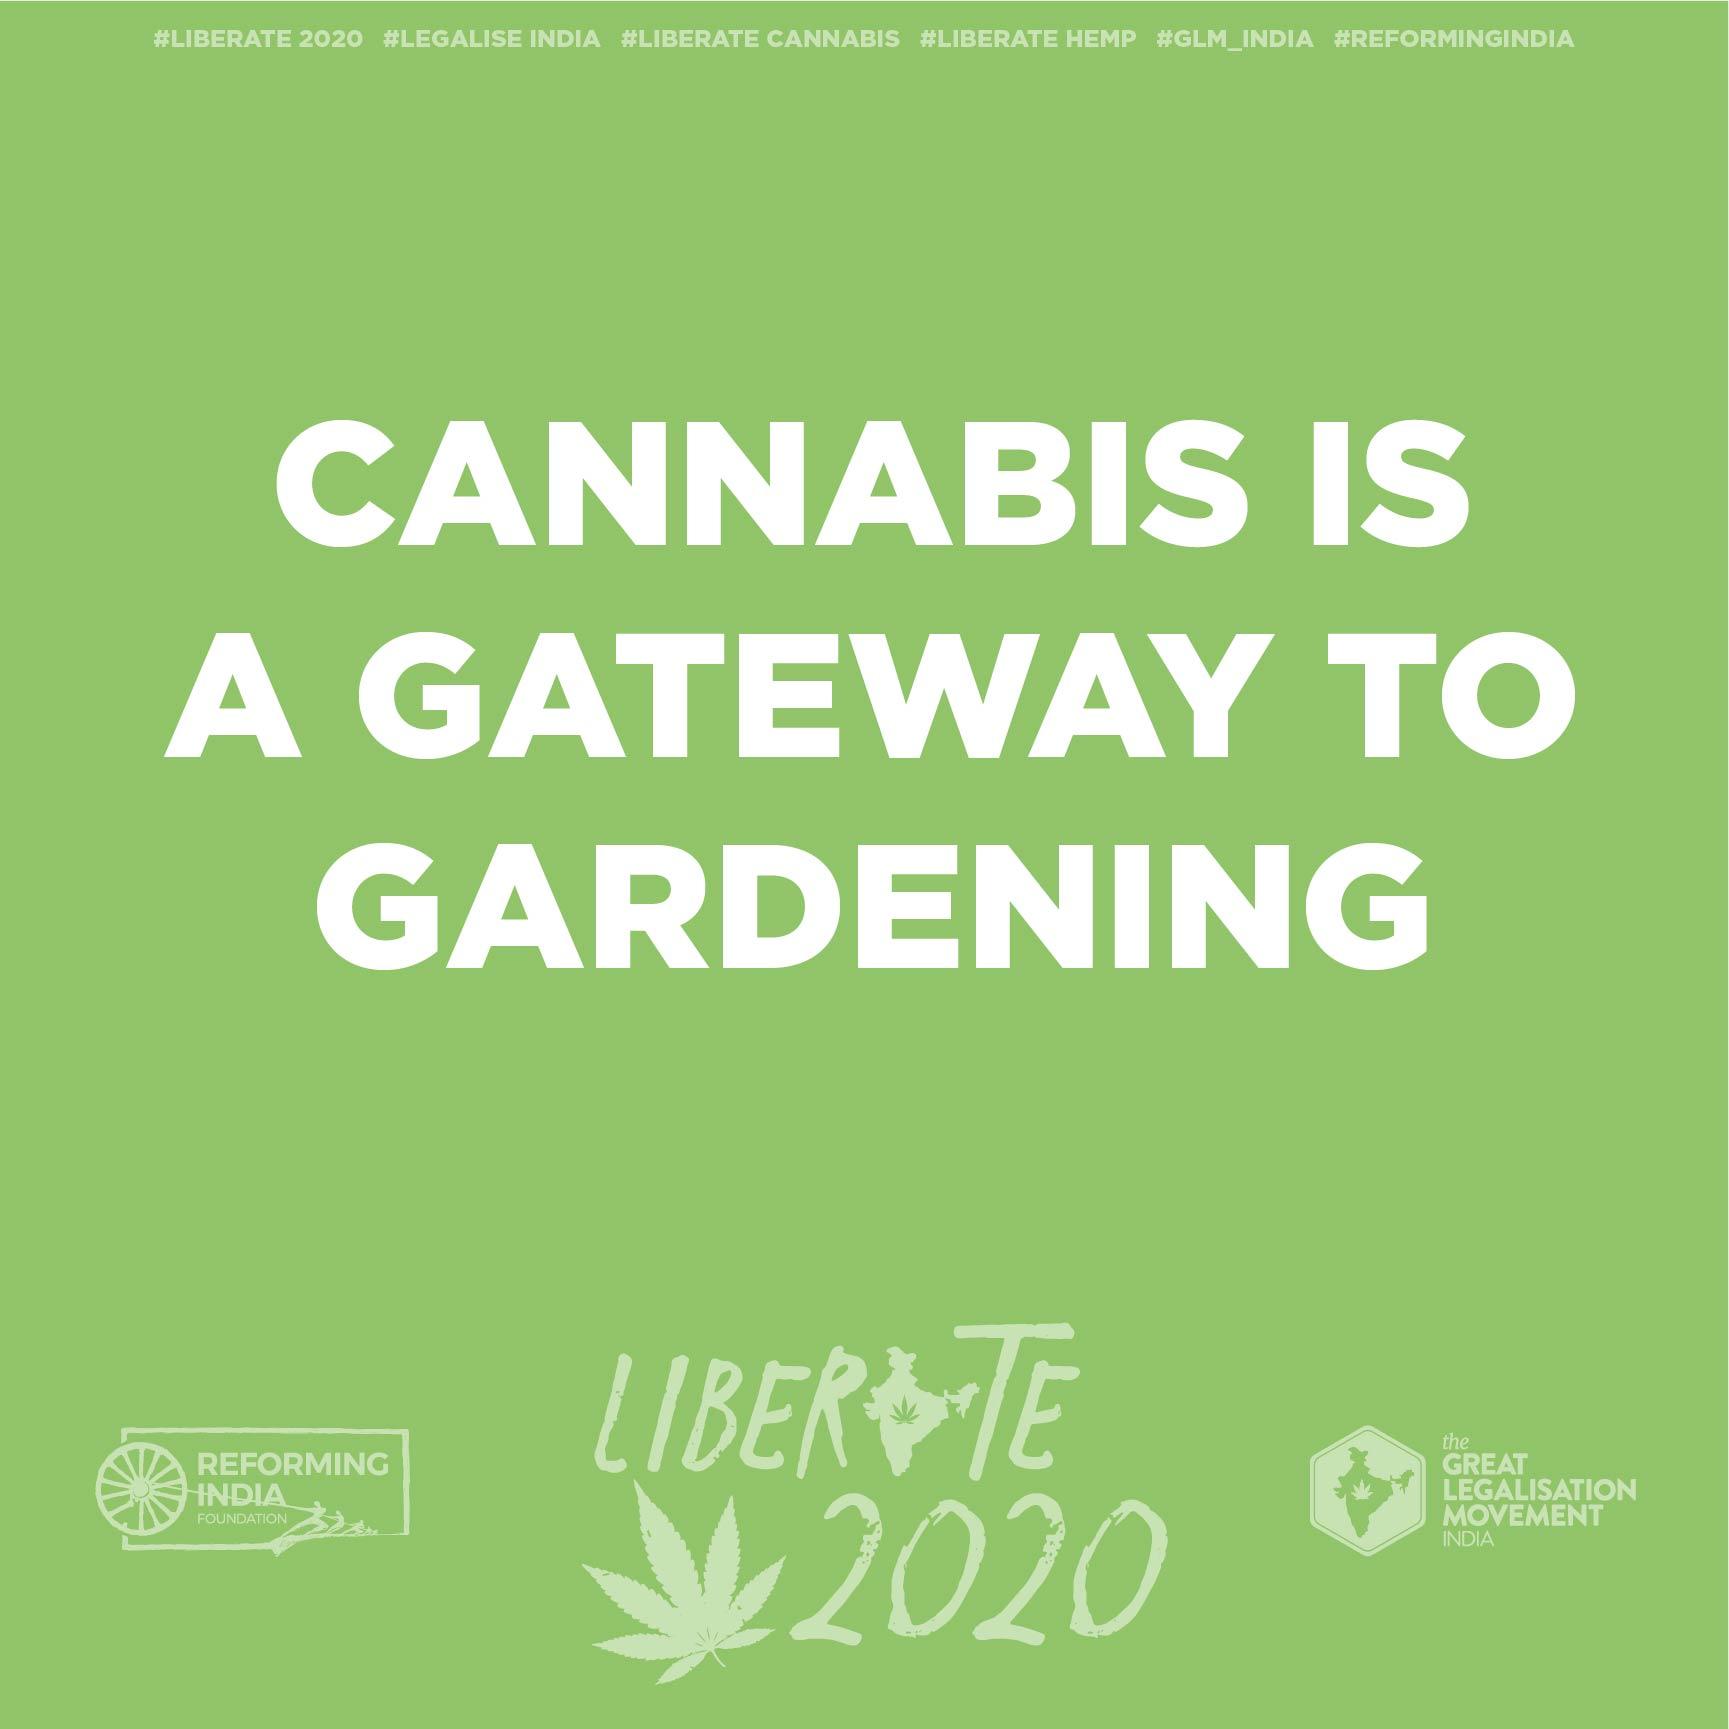 cannabisArtboard 1 copy 10-50.jpg